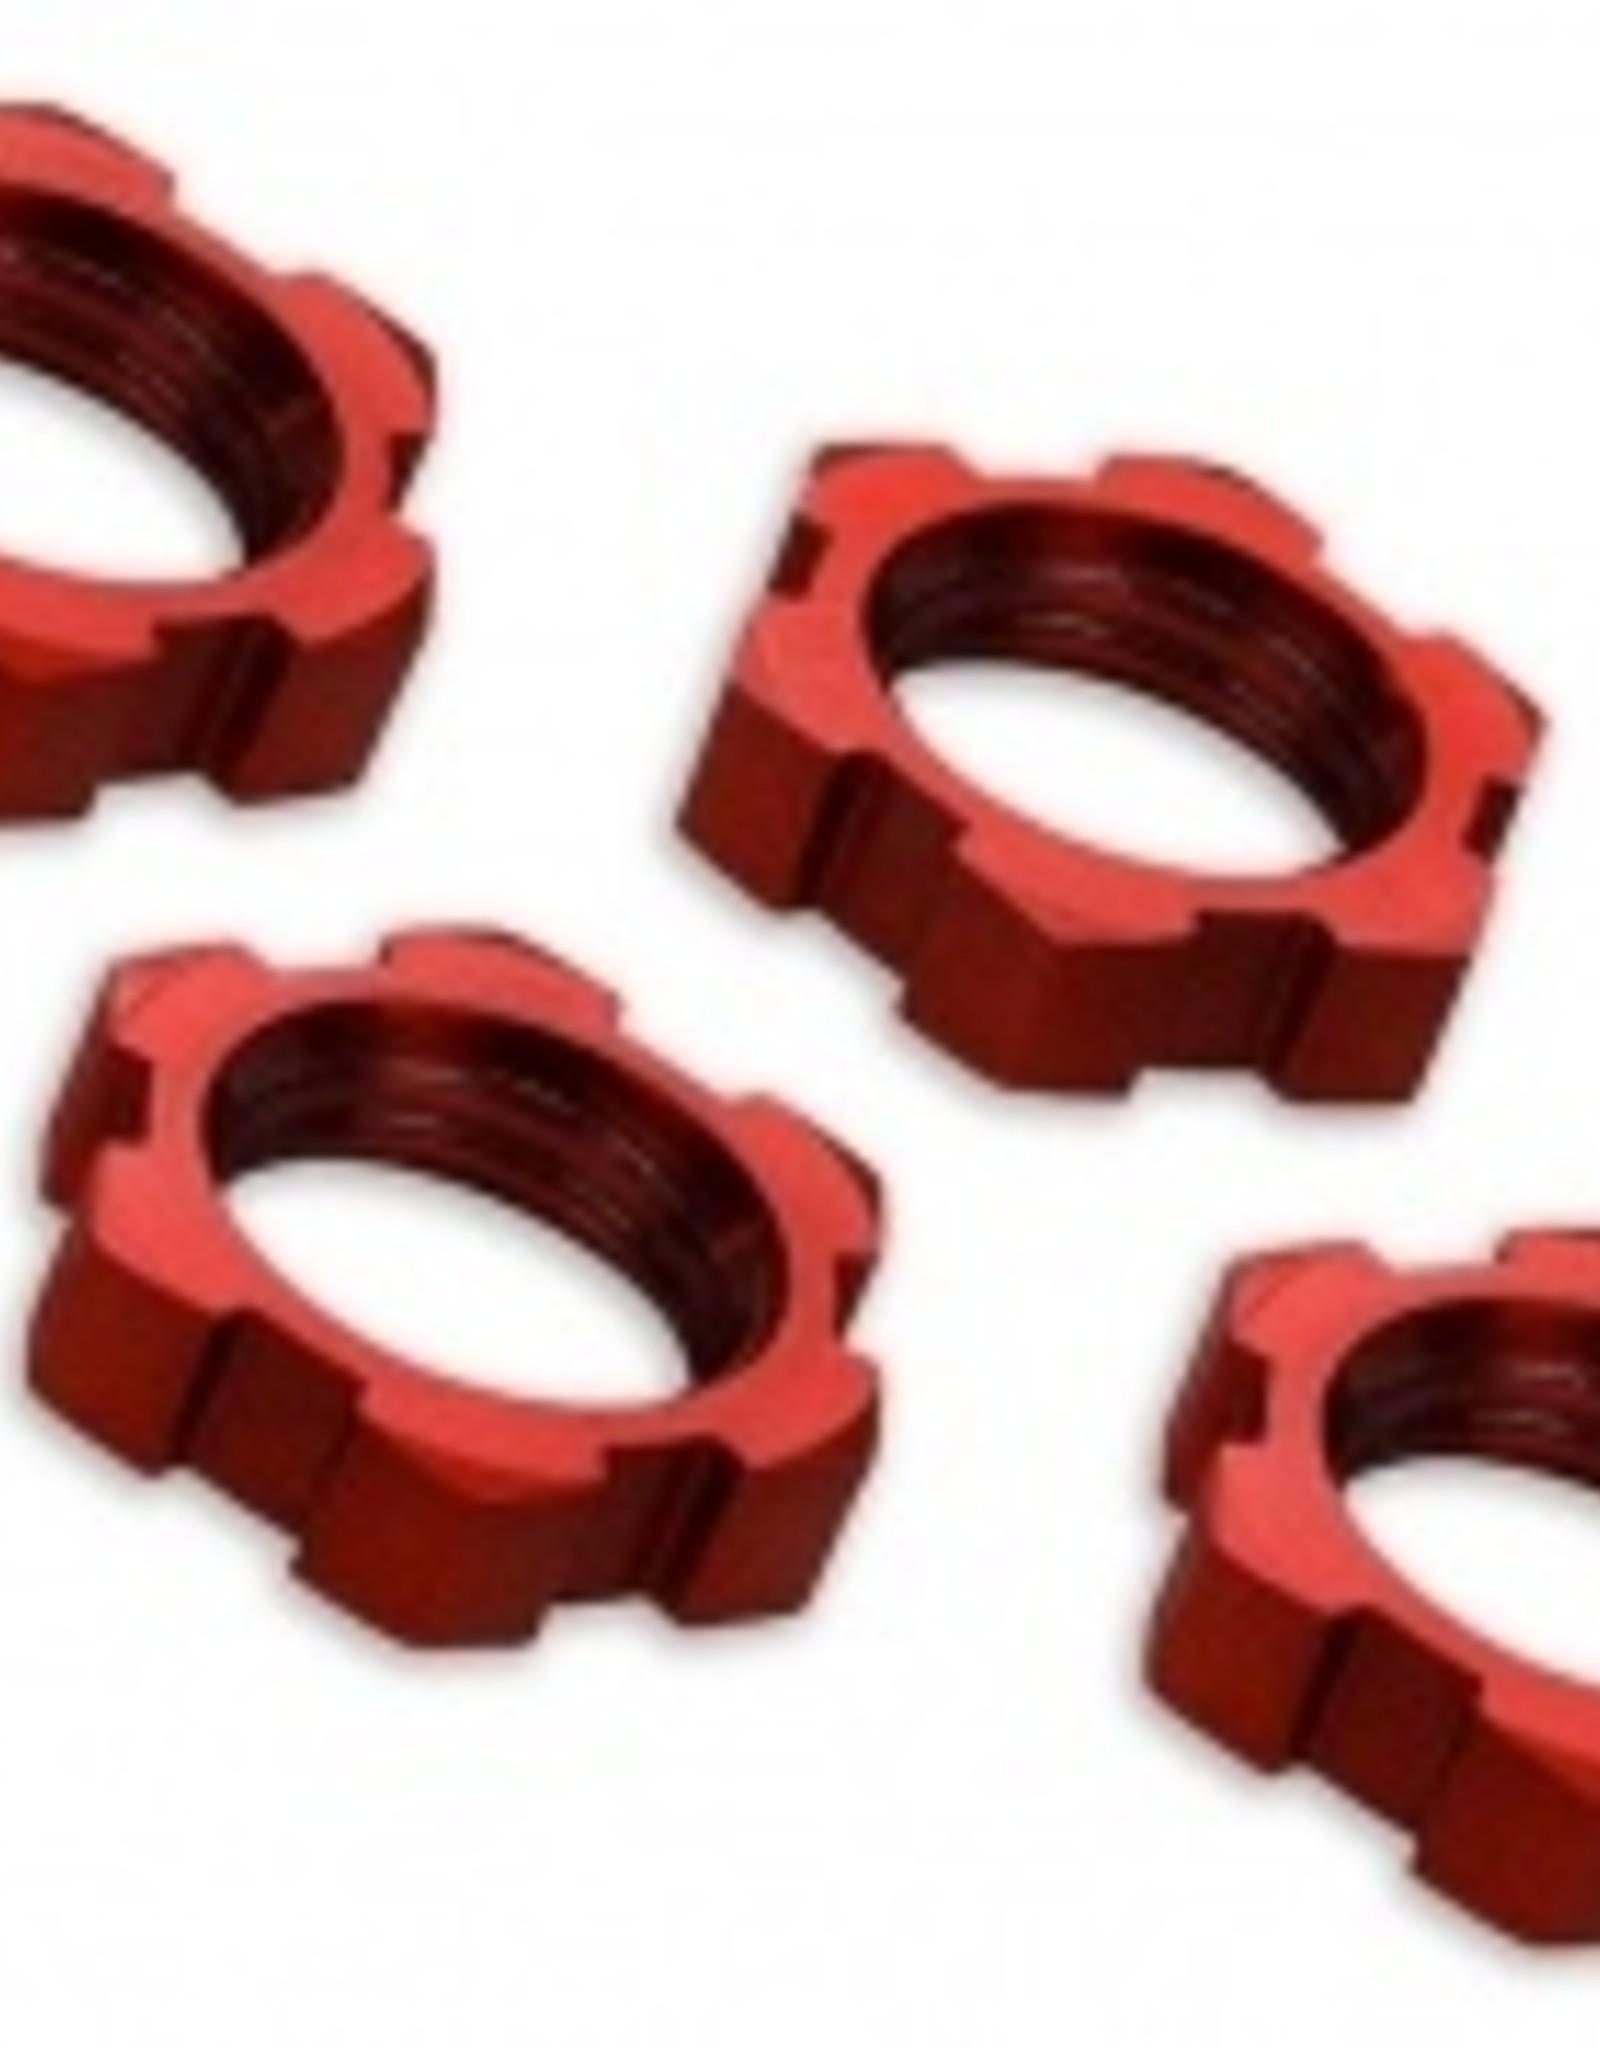 Traxxas Traxxas Wheel nuts, splined, 17mm, serrated (red-anodized) (4)